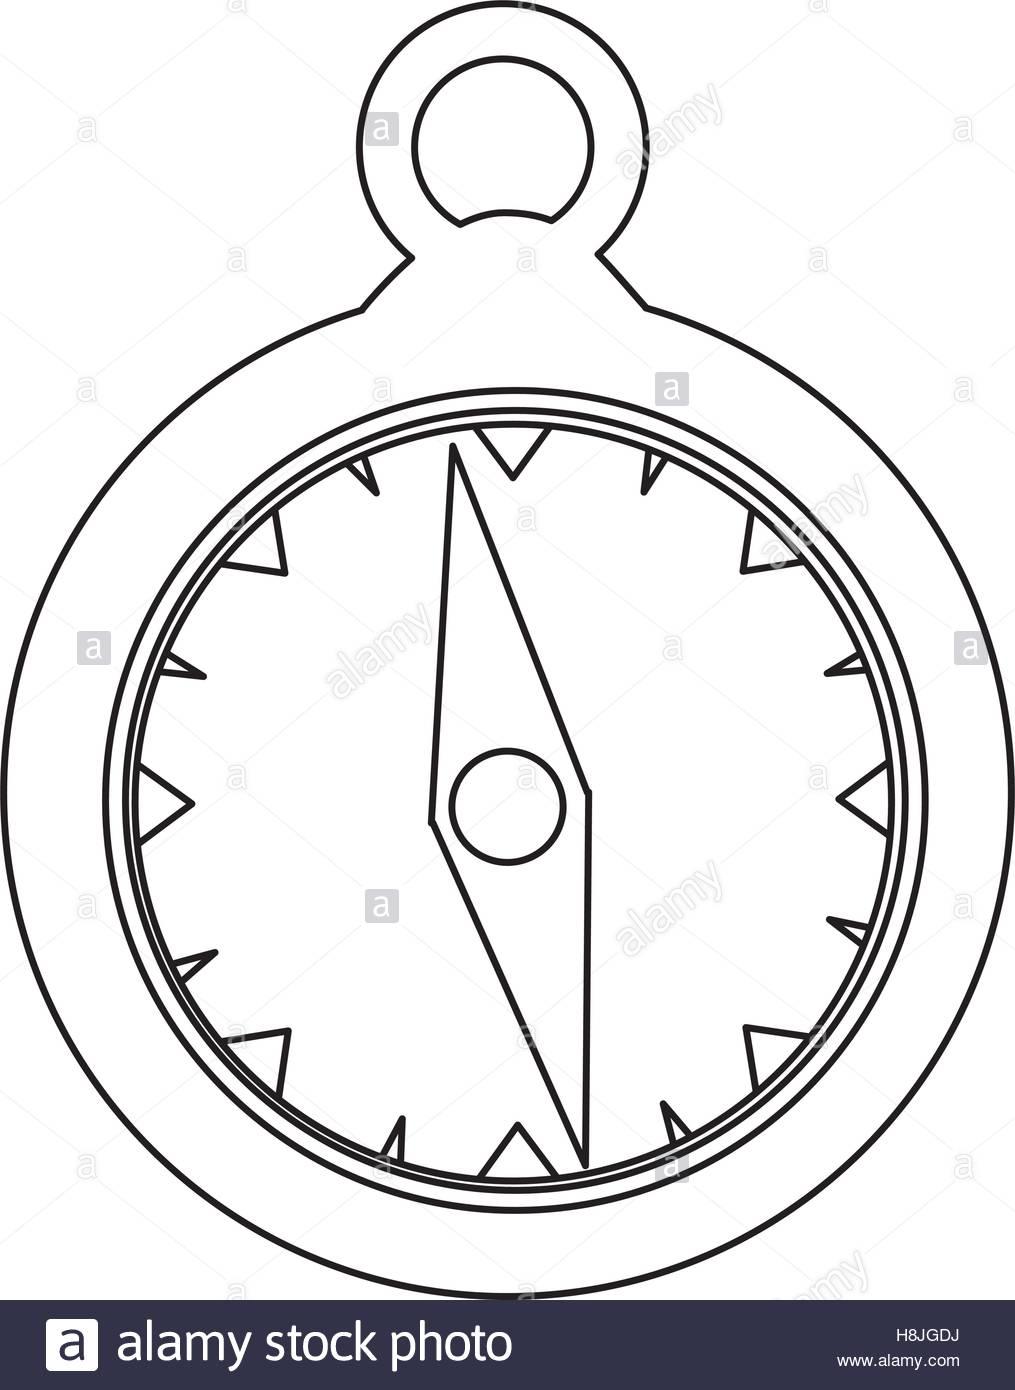 1015x1390 Simple Compass Icon Image Vector Illustration Design Stock Vector